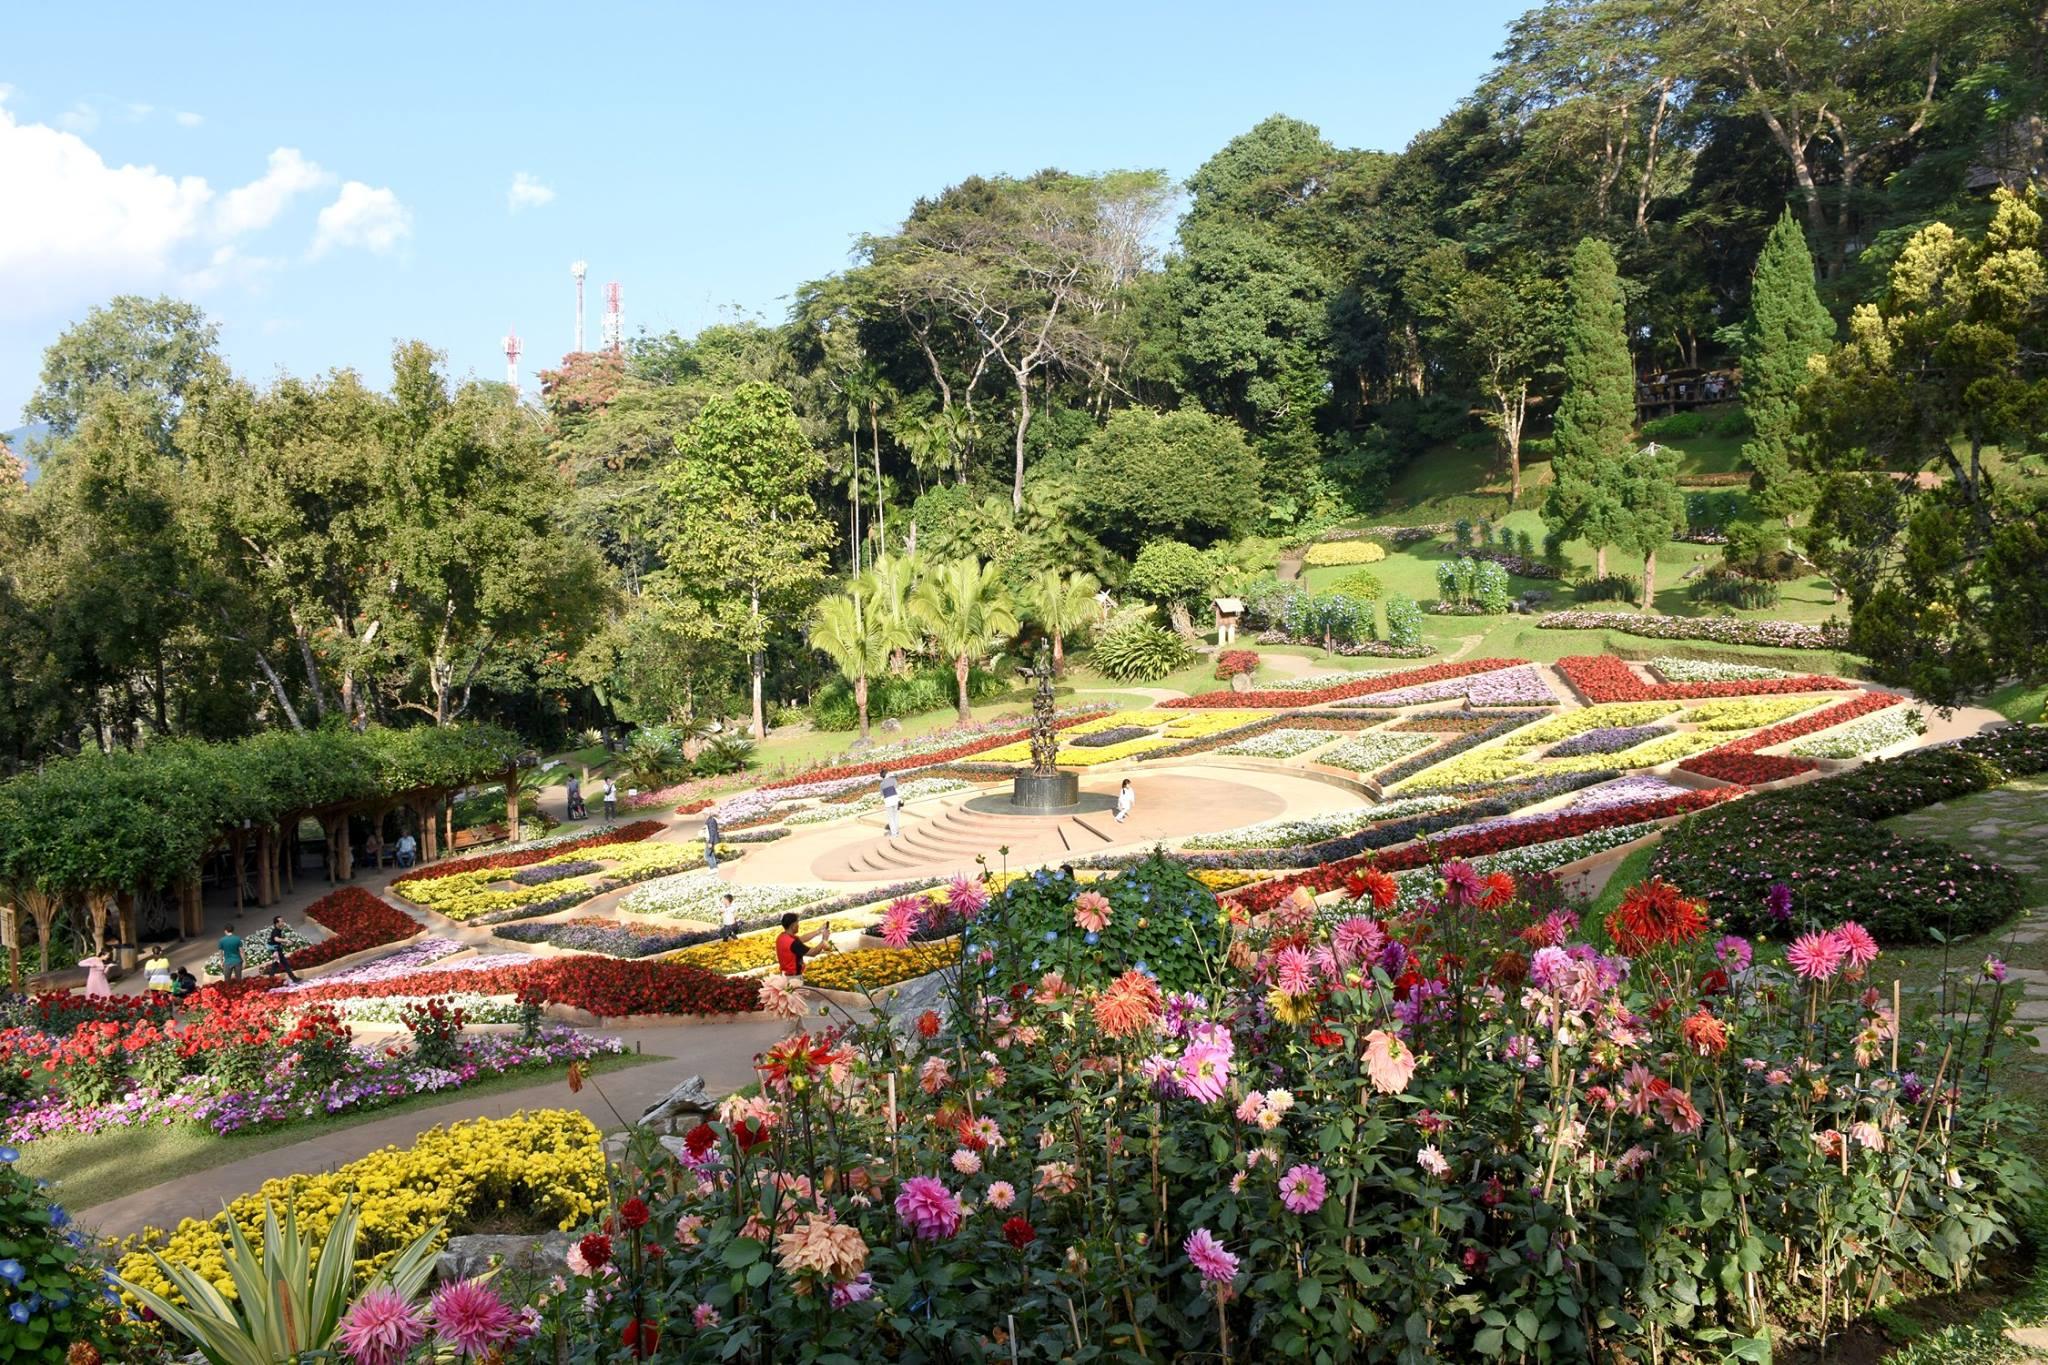 Mae Fah Luang Garden, Chiang Rai, Thailand